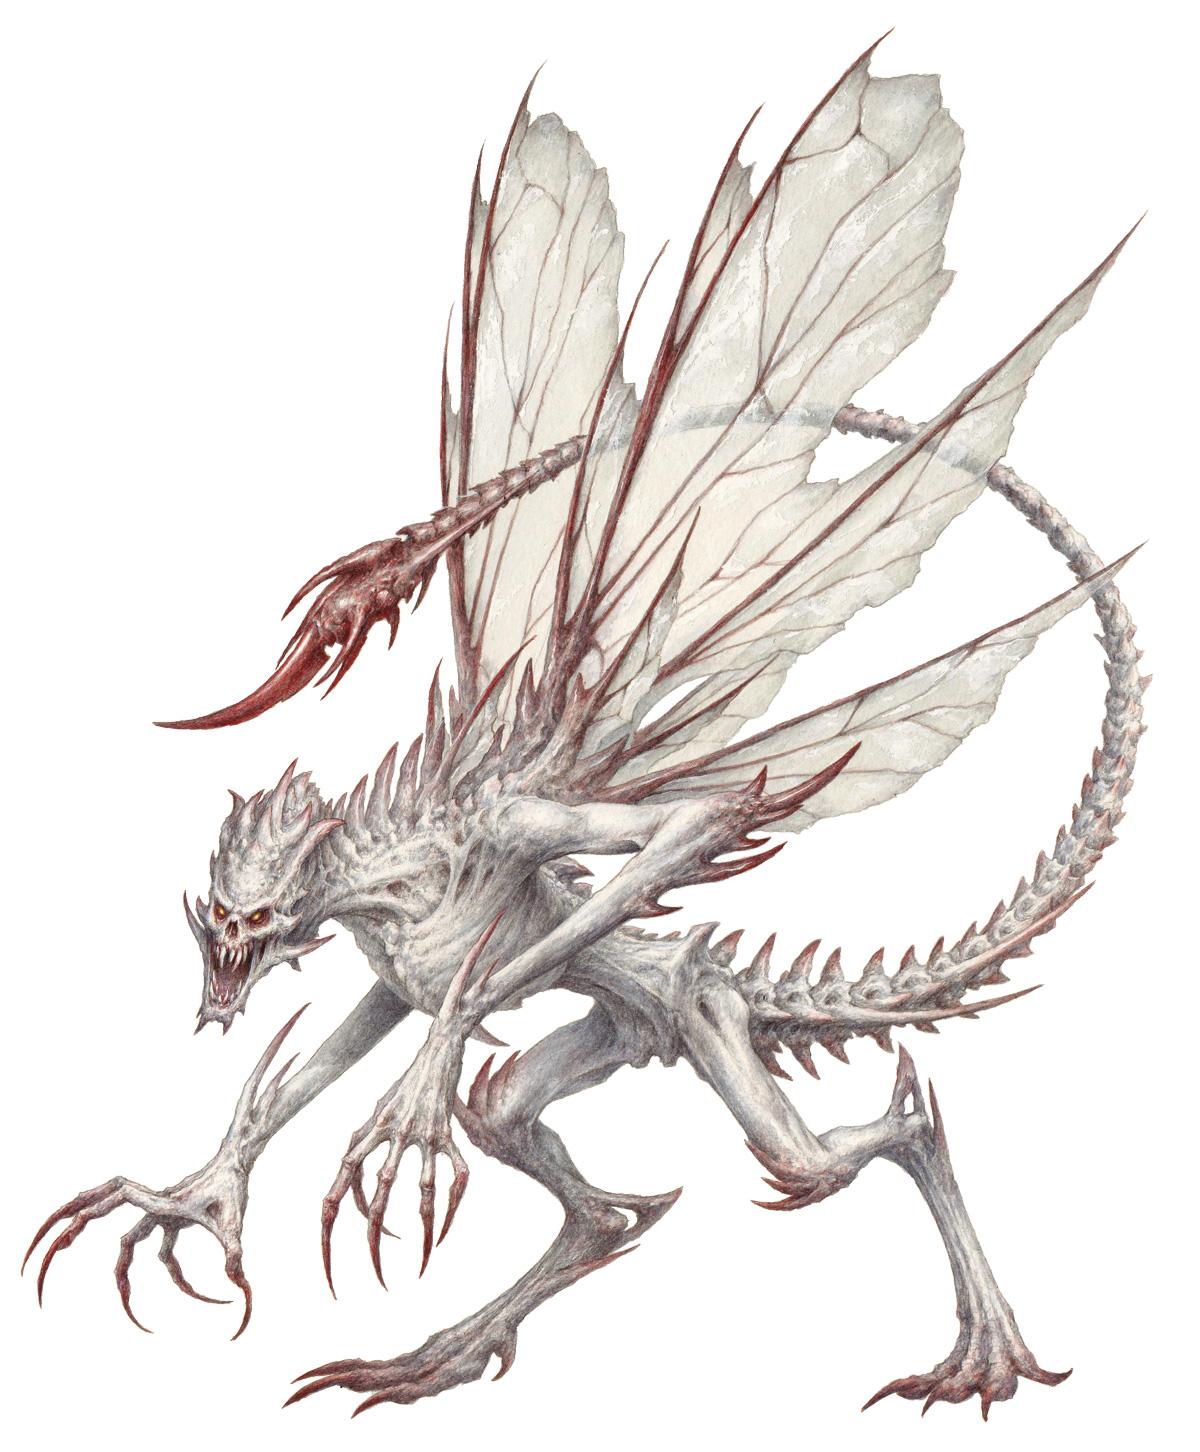 Osyluth | Forgotten Realms Wiki | Fandom